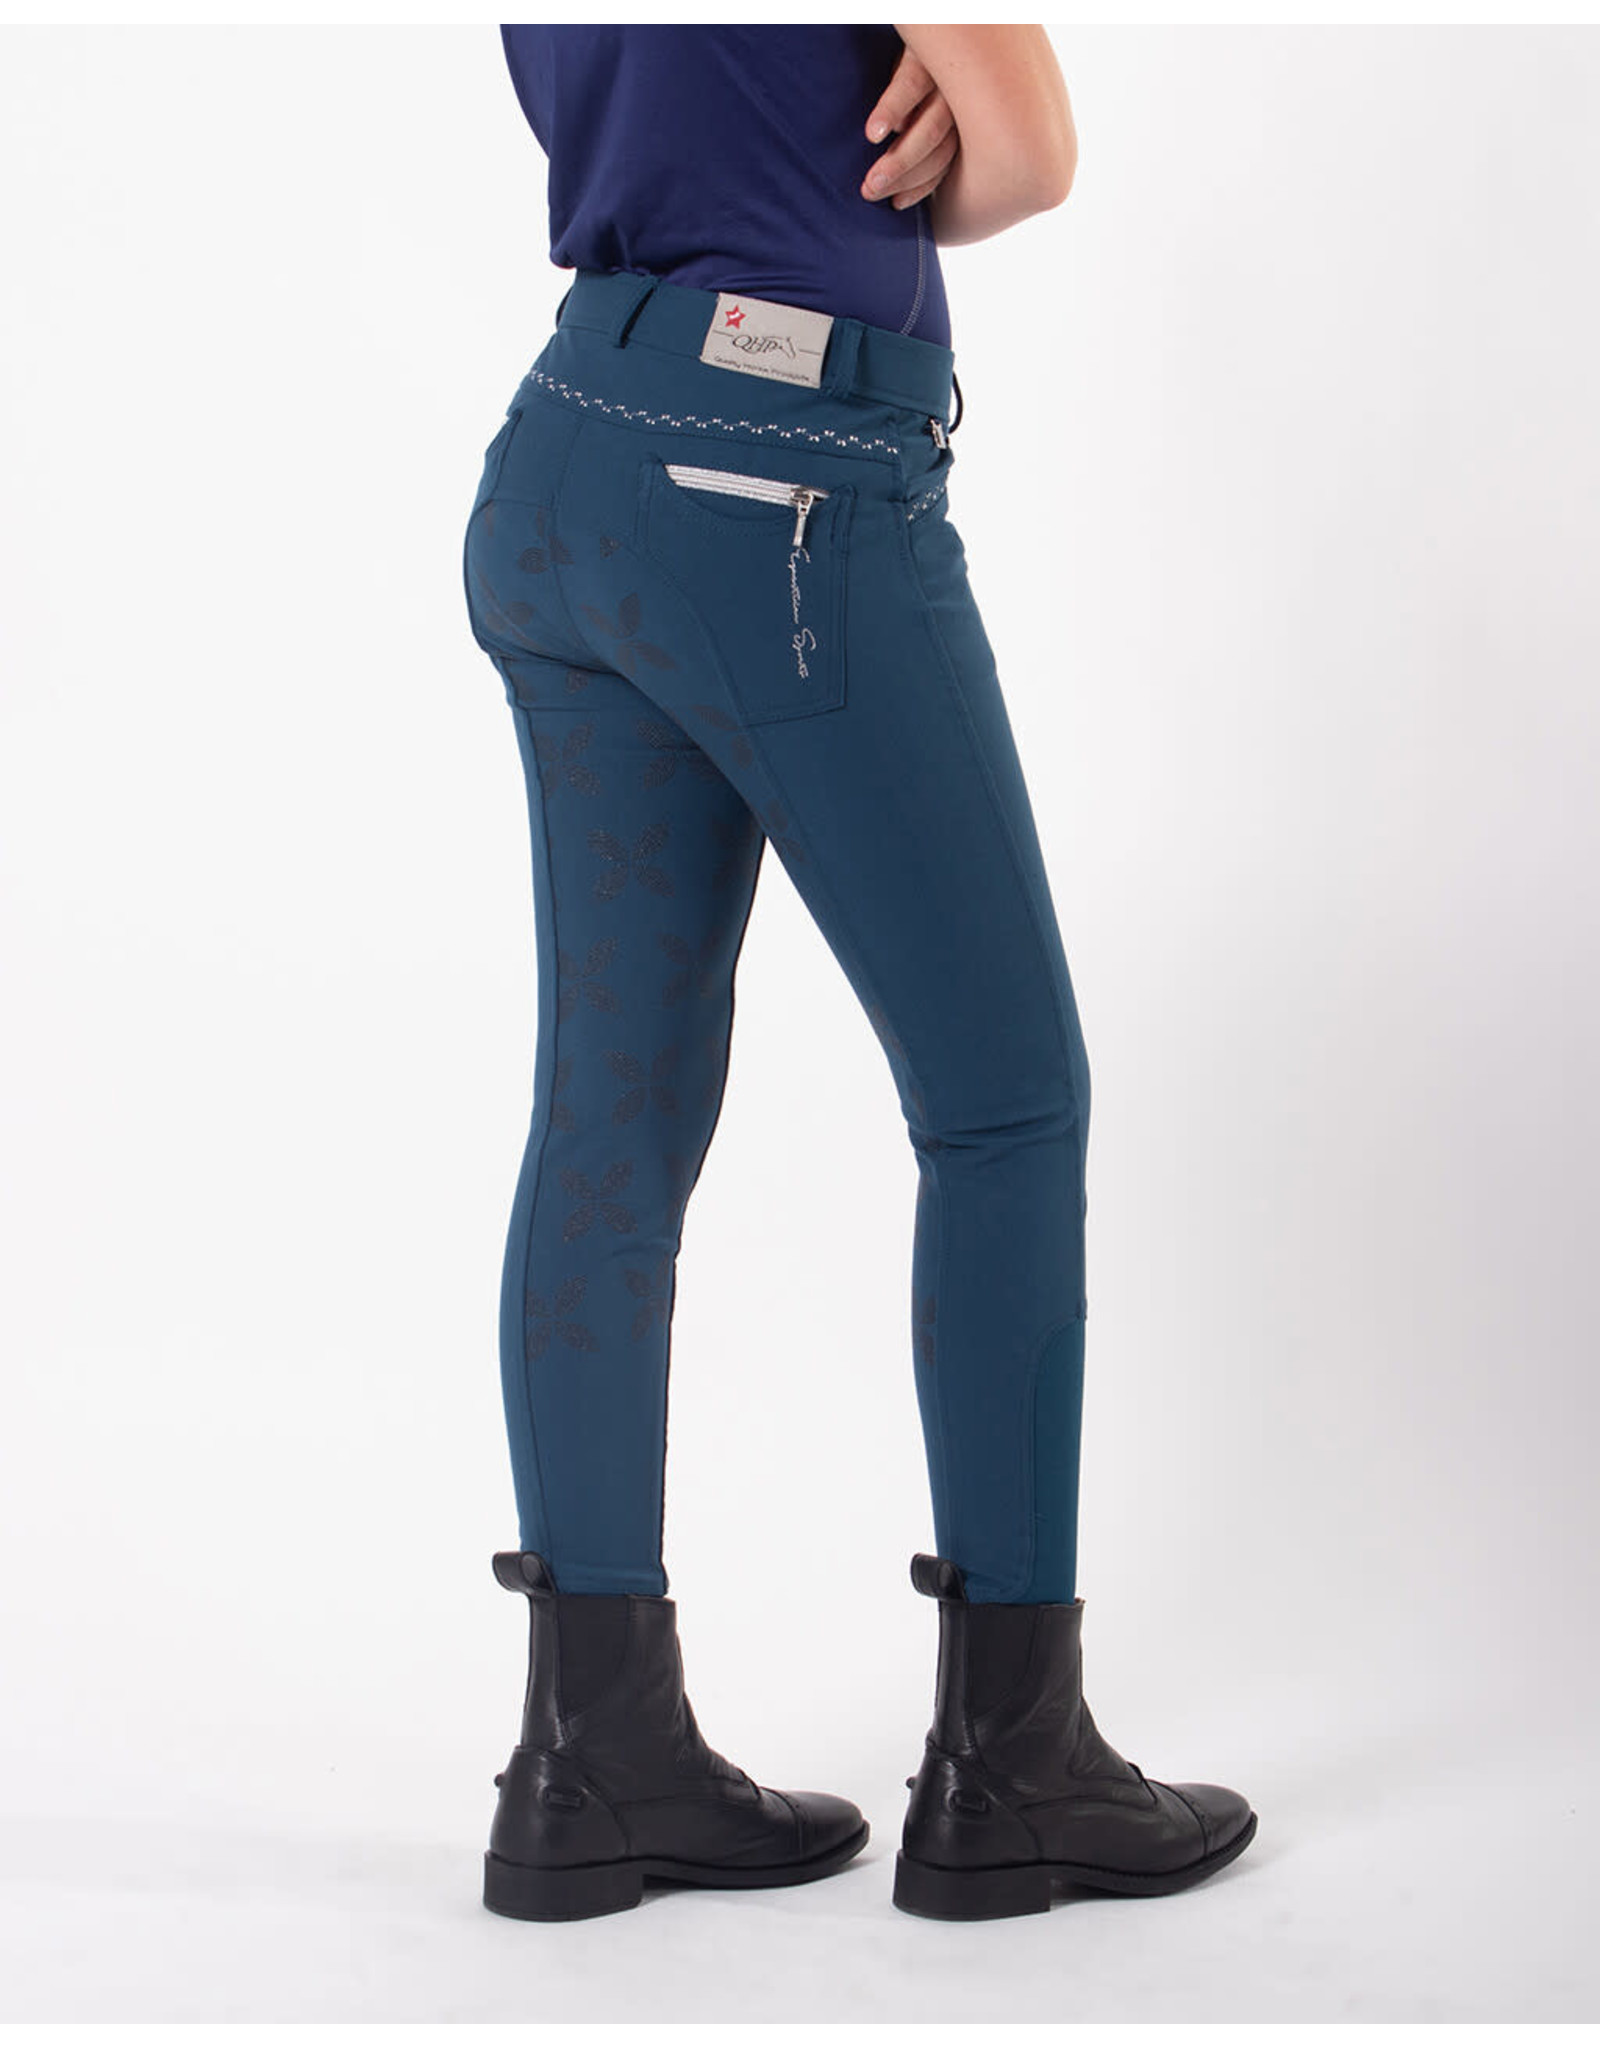 QHP QHP Rijbroek Lauren Junior anti-slip zitvlak Petrol